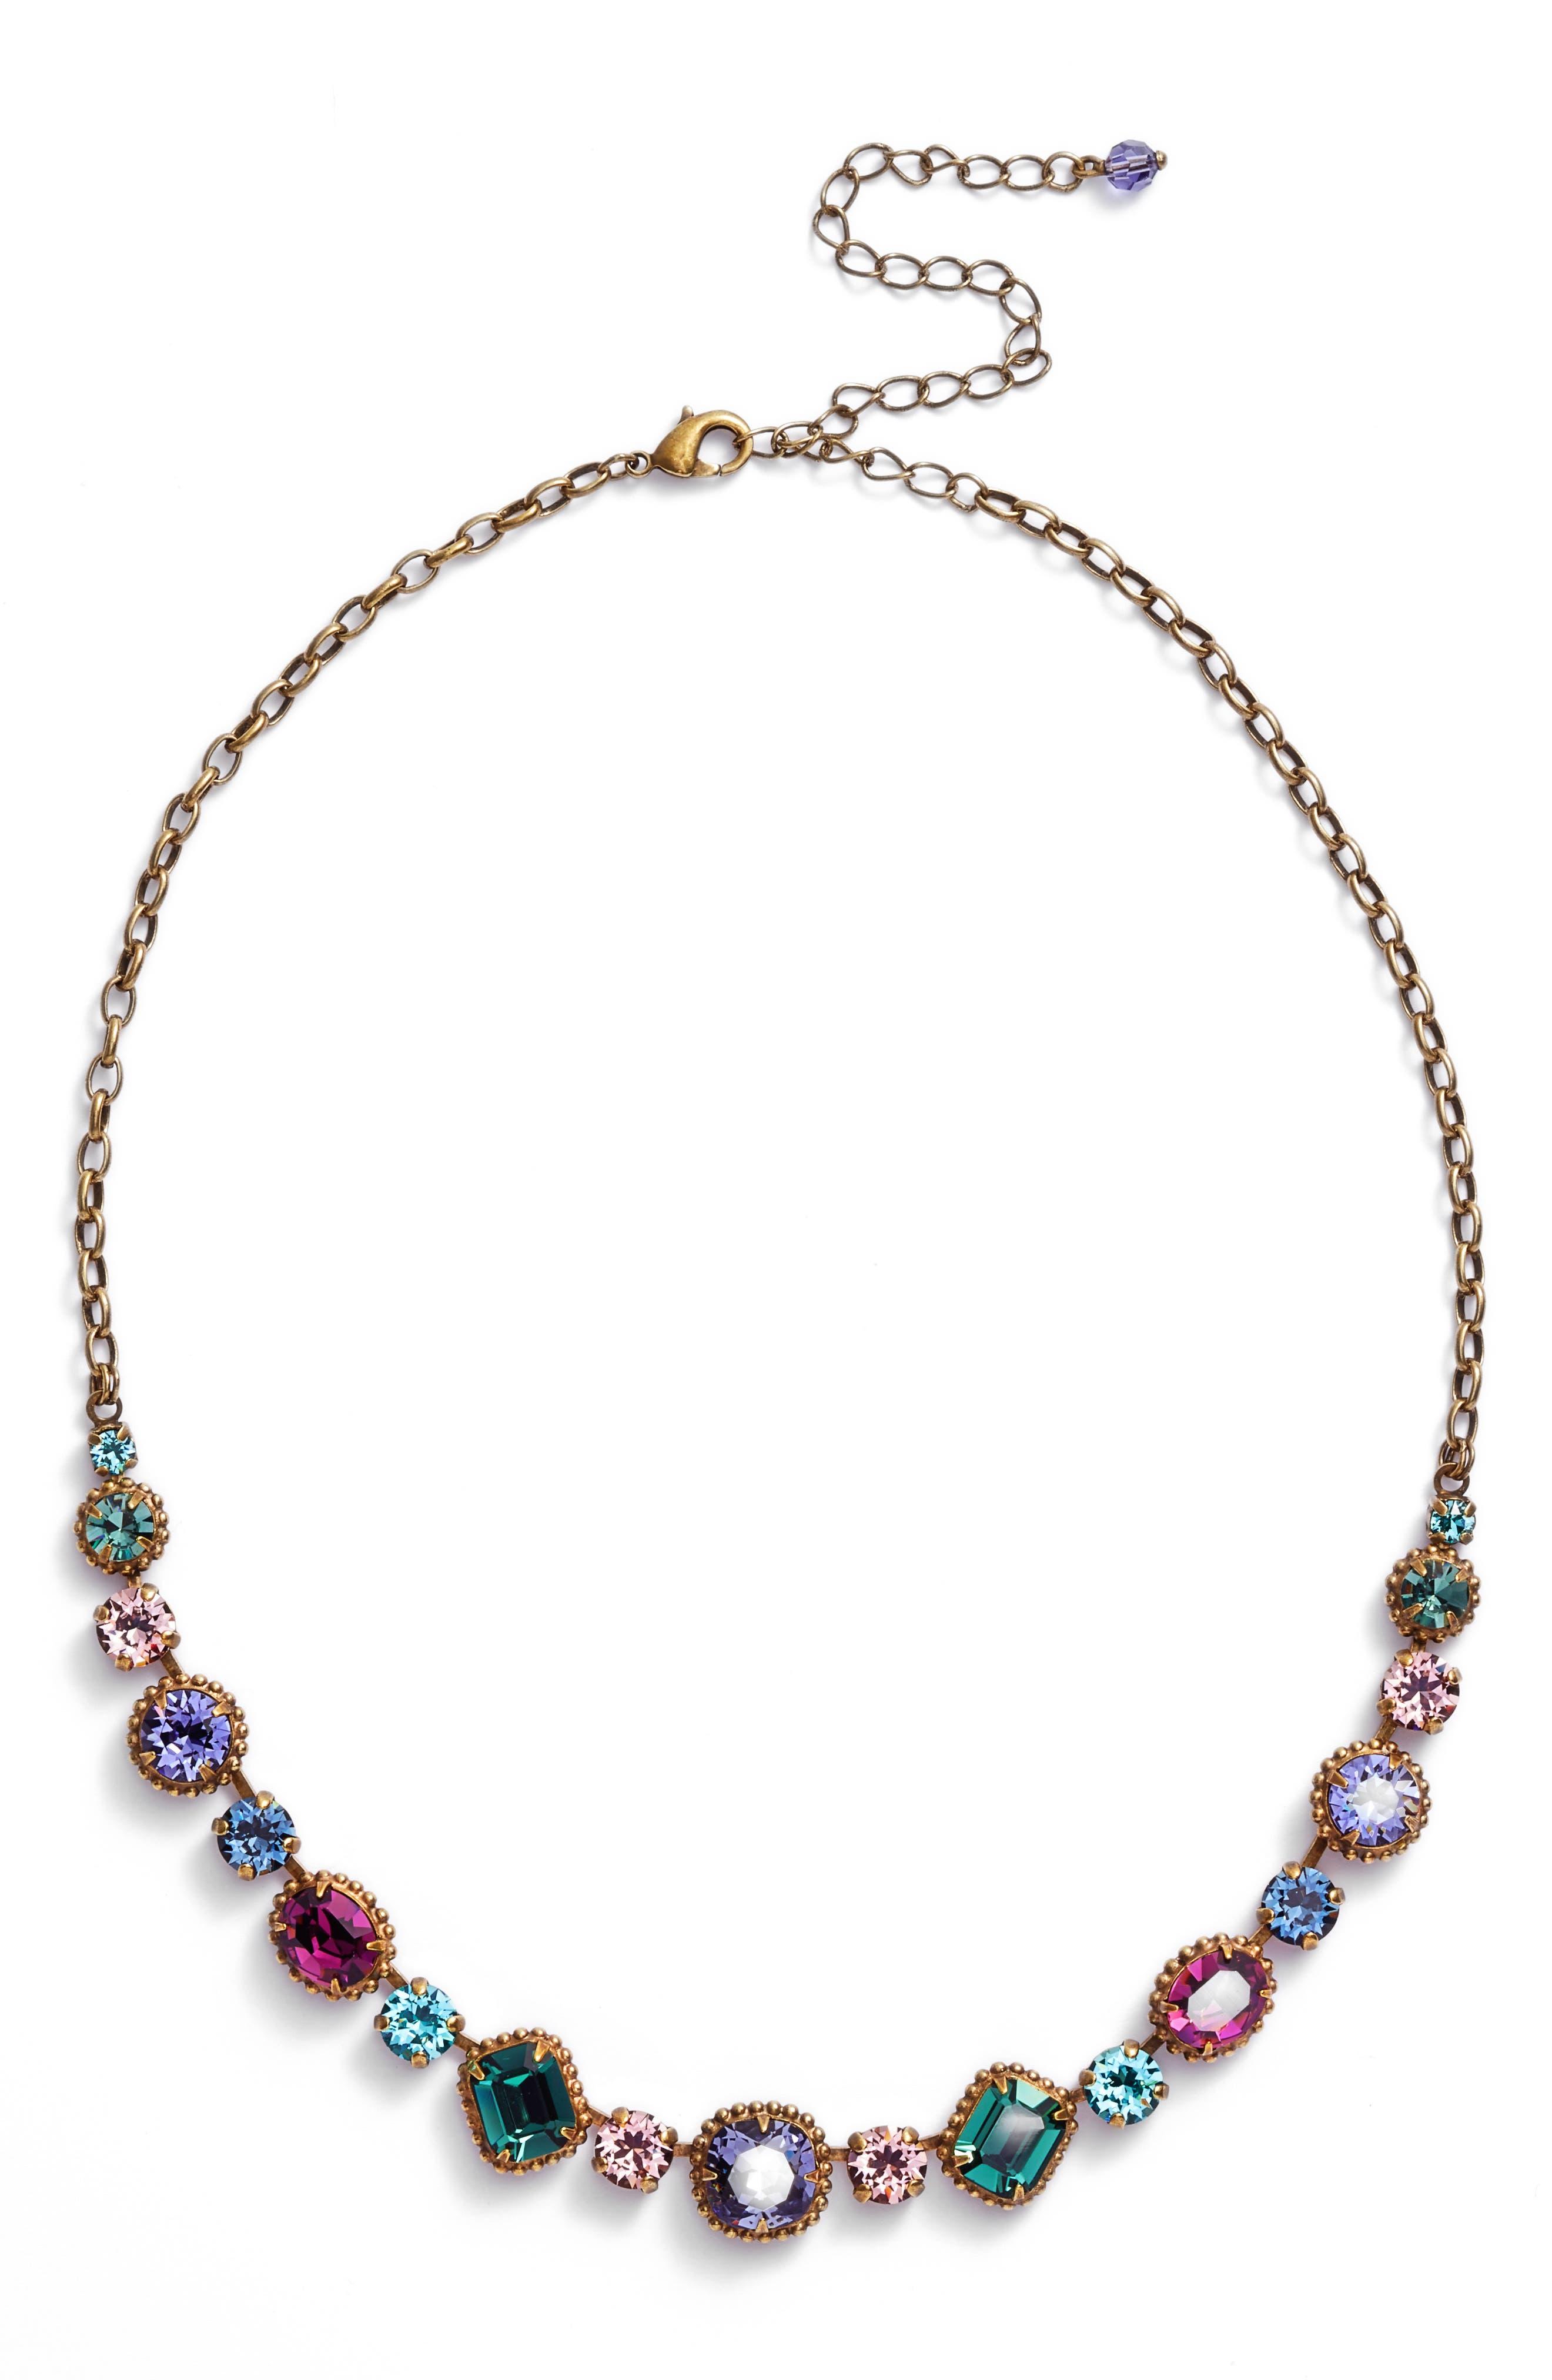 Embellished Elegance Necklace,                             Main thumbnail 1, color,                             Multi